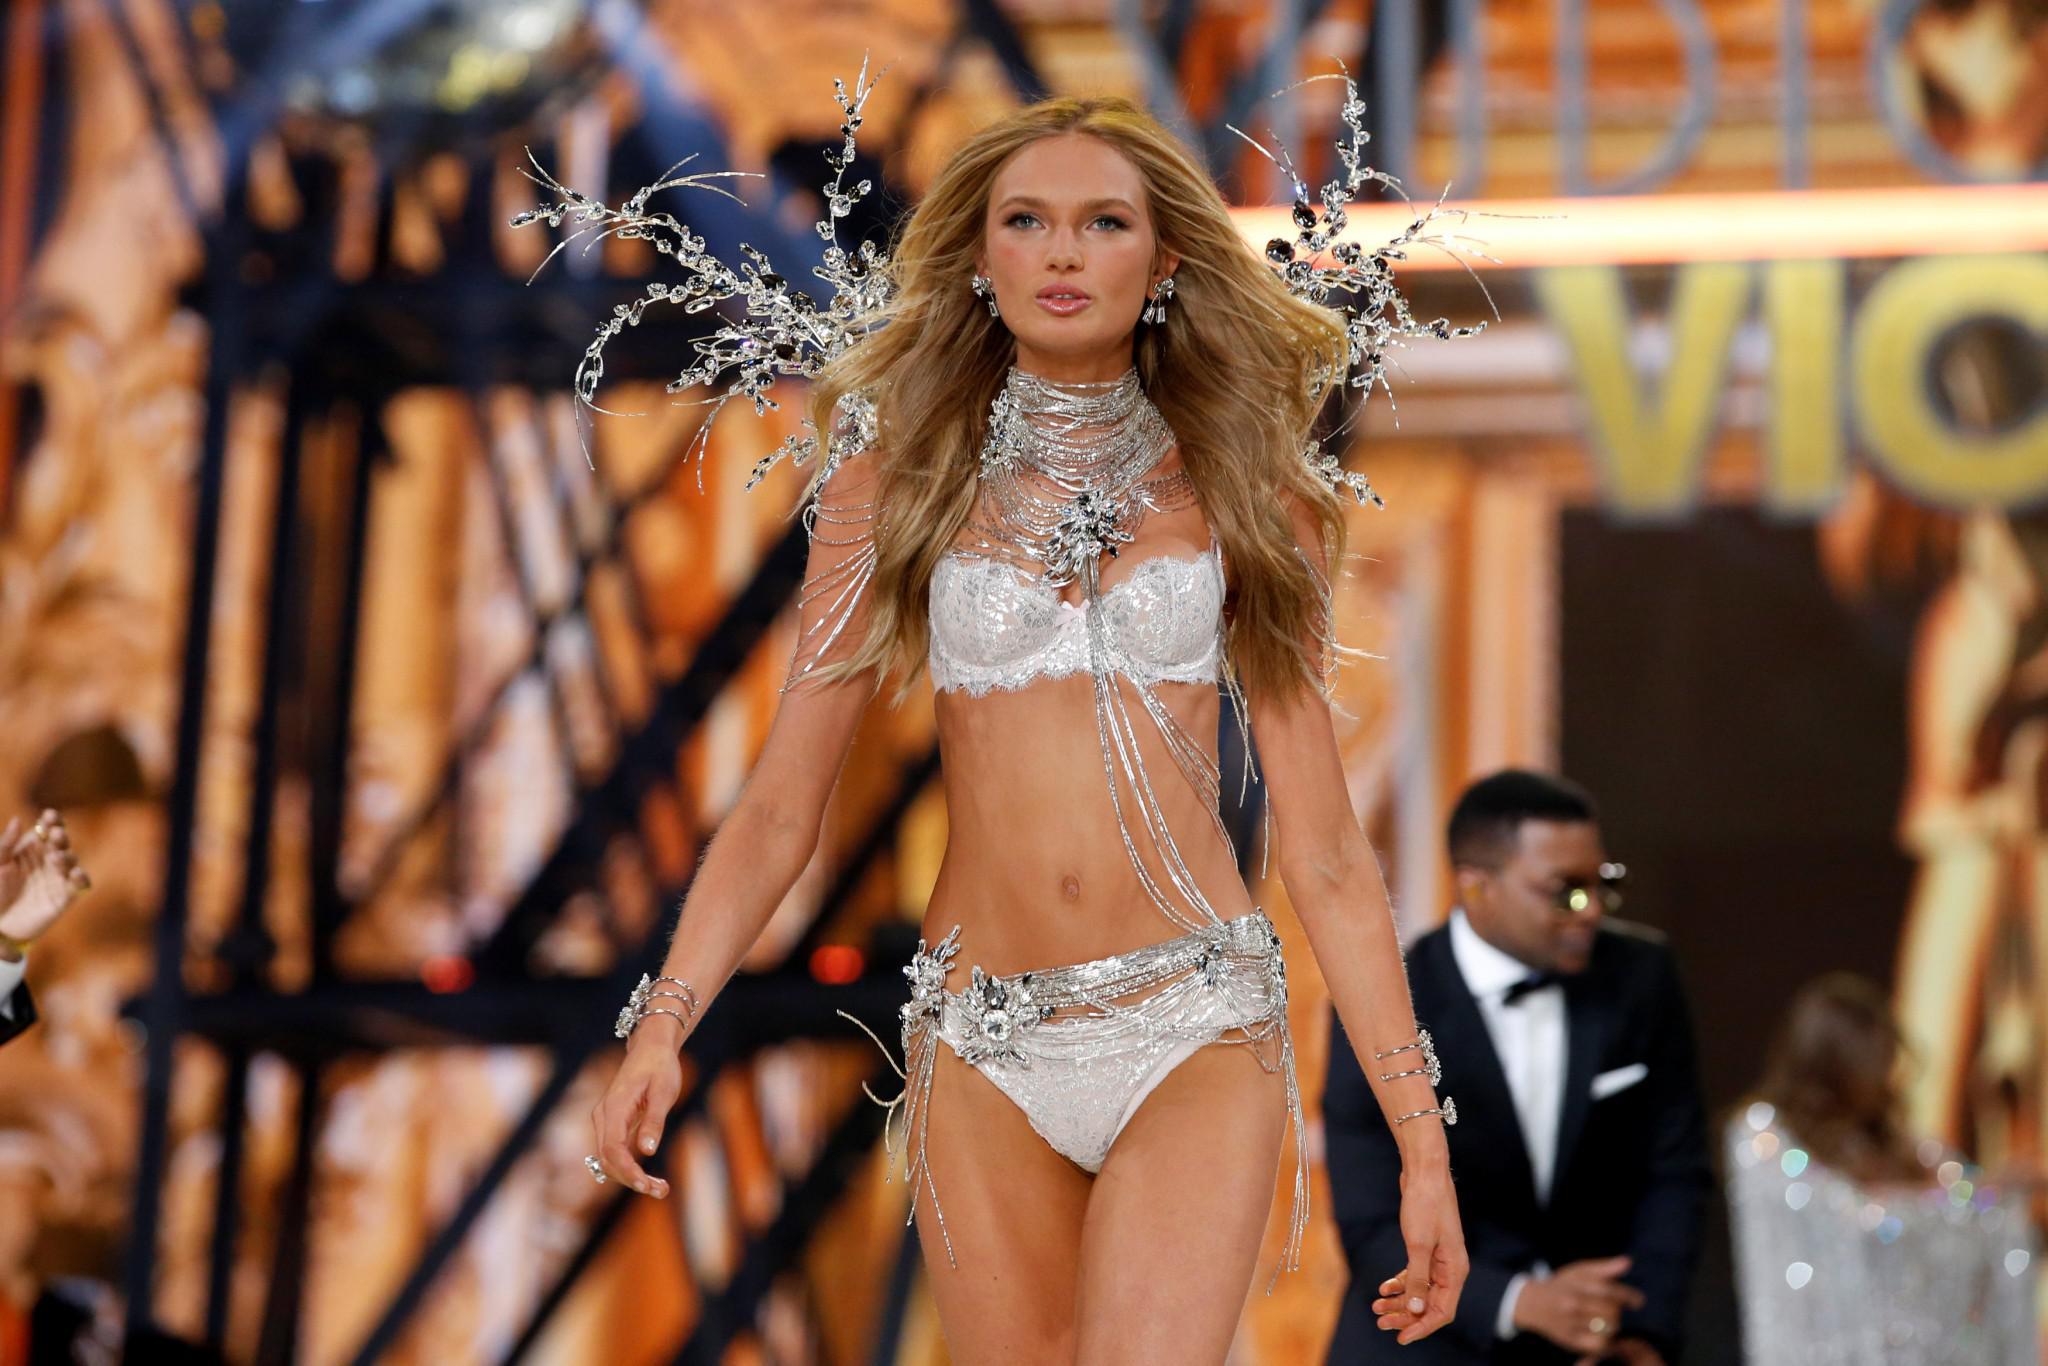 Victoria-Secret-show-esorouxa-modela-1300-20 Το show της Victoria's Secret που «κόλασε» το Παρίσι με τα αγγελάκια της